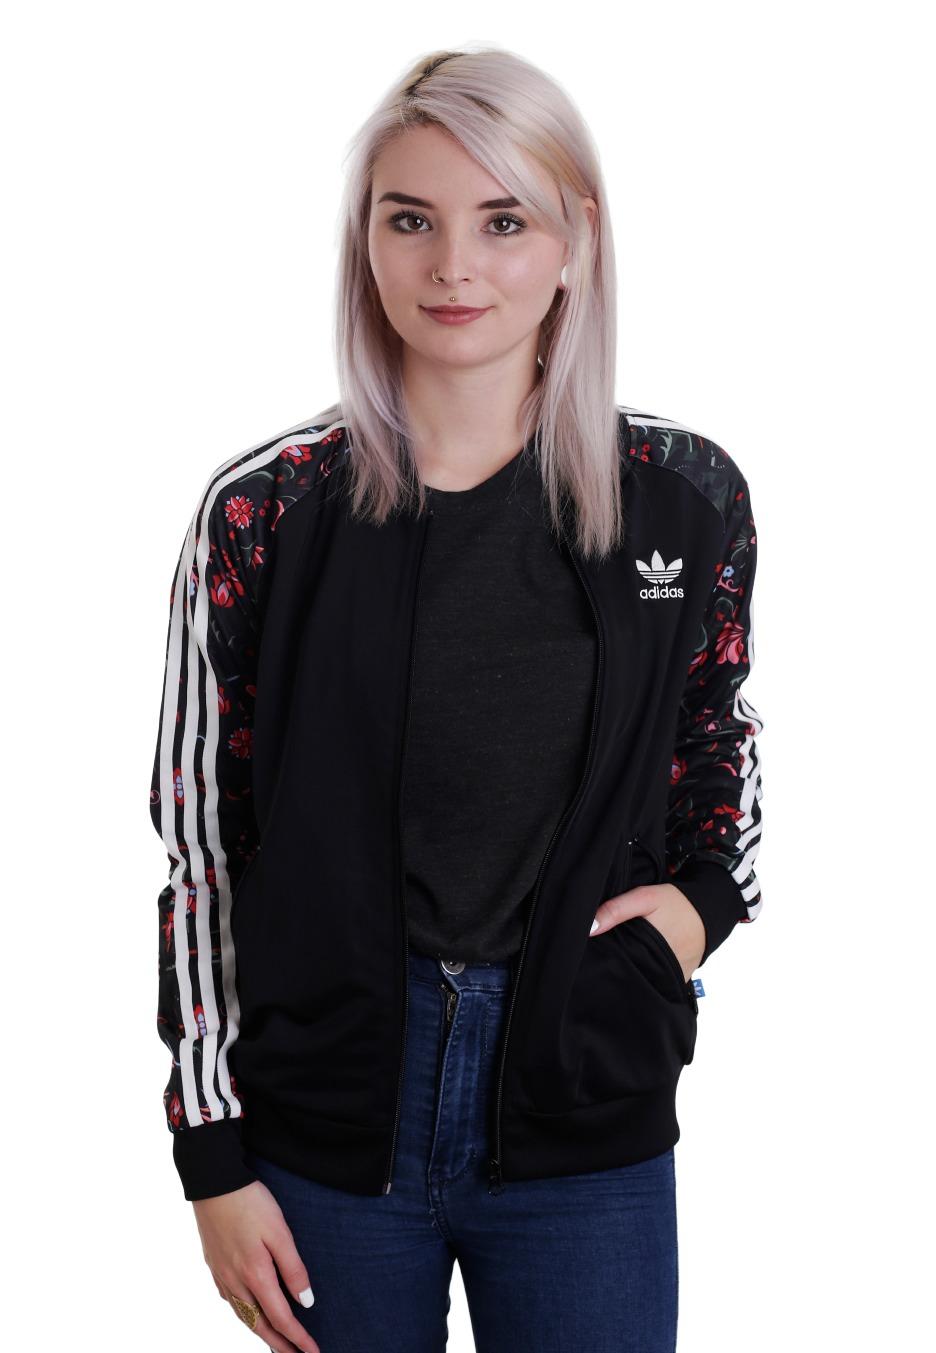 Adidas Superstar Online Belgie